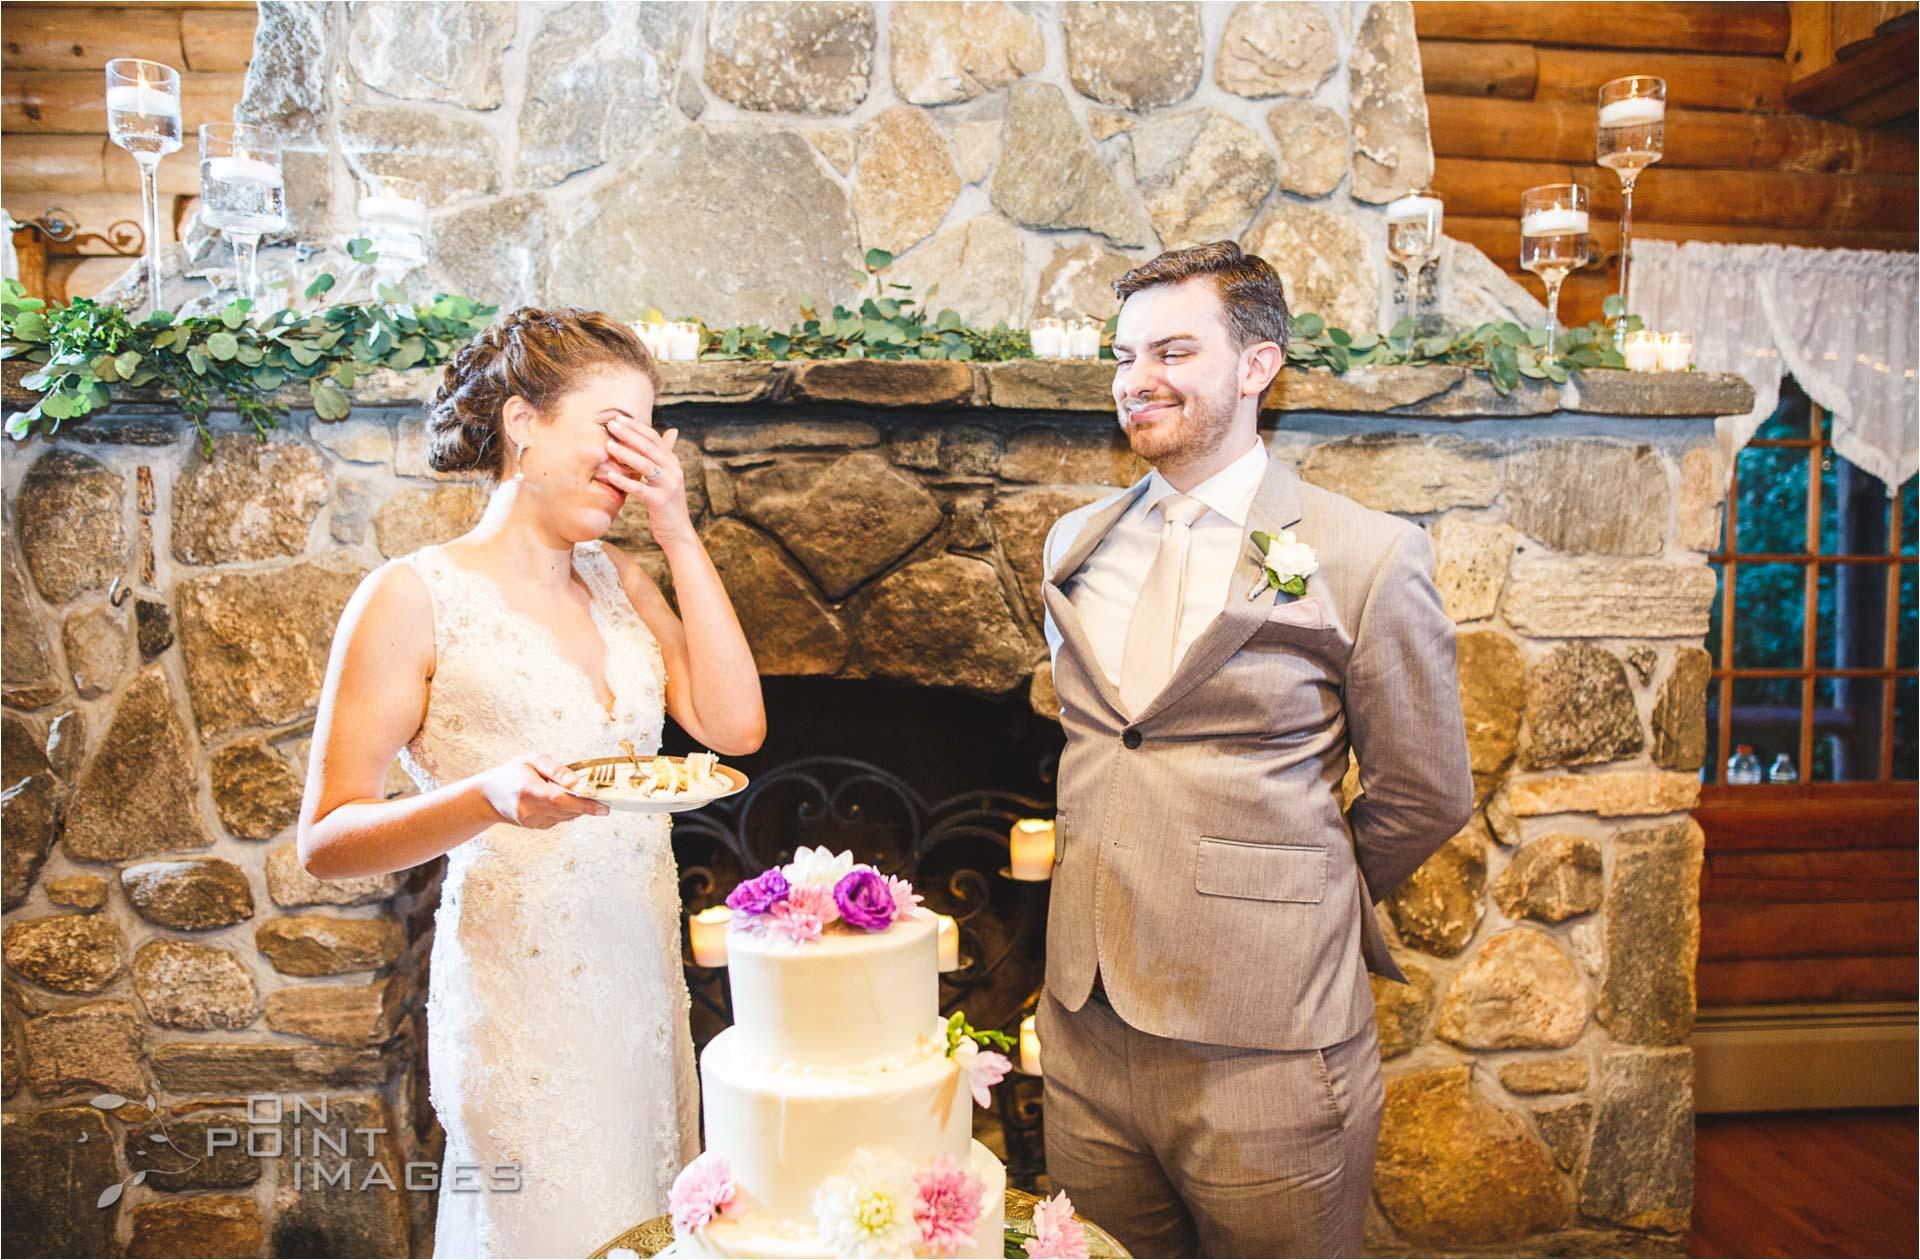 wickham-park-wedding-photographer-ct-37.jpg